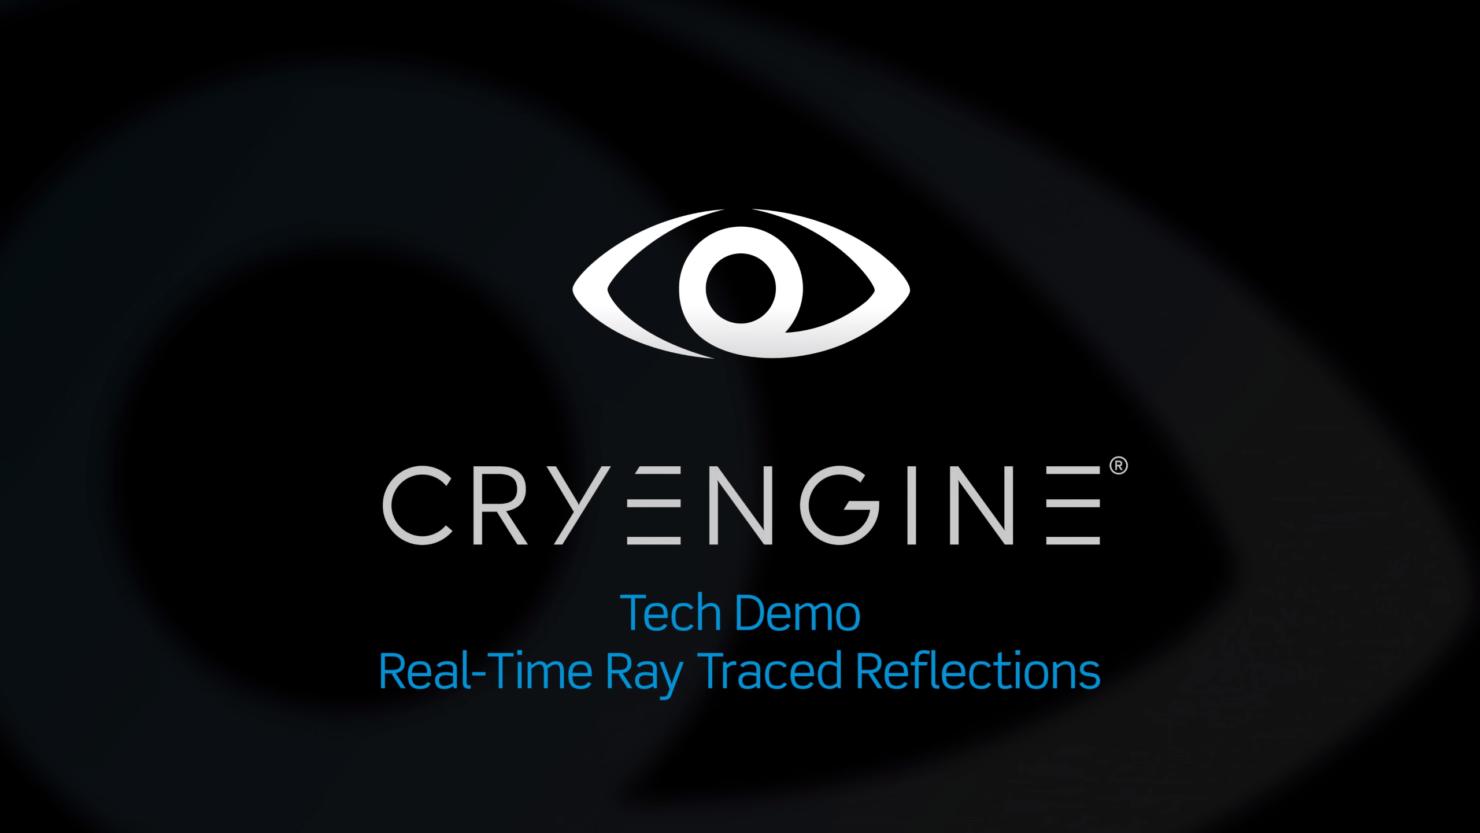 crytek-nori-real-time-raytracing-demo-amd-radeon-rx-vega-56-nvidia-amd-graphics-cards_2